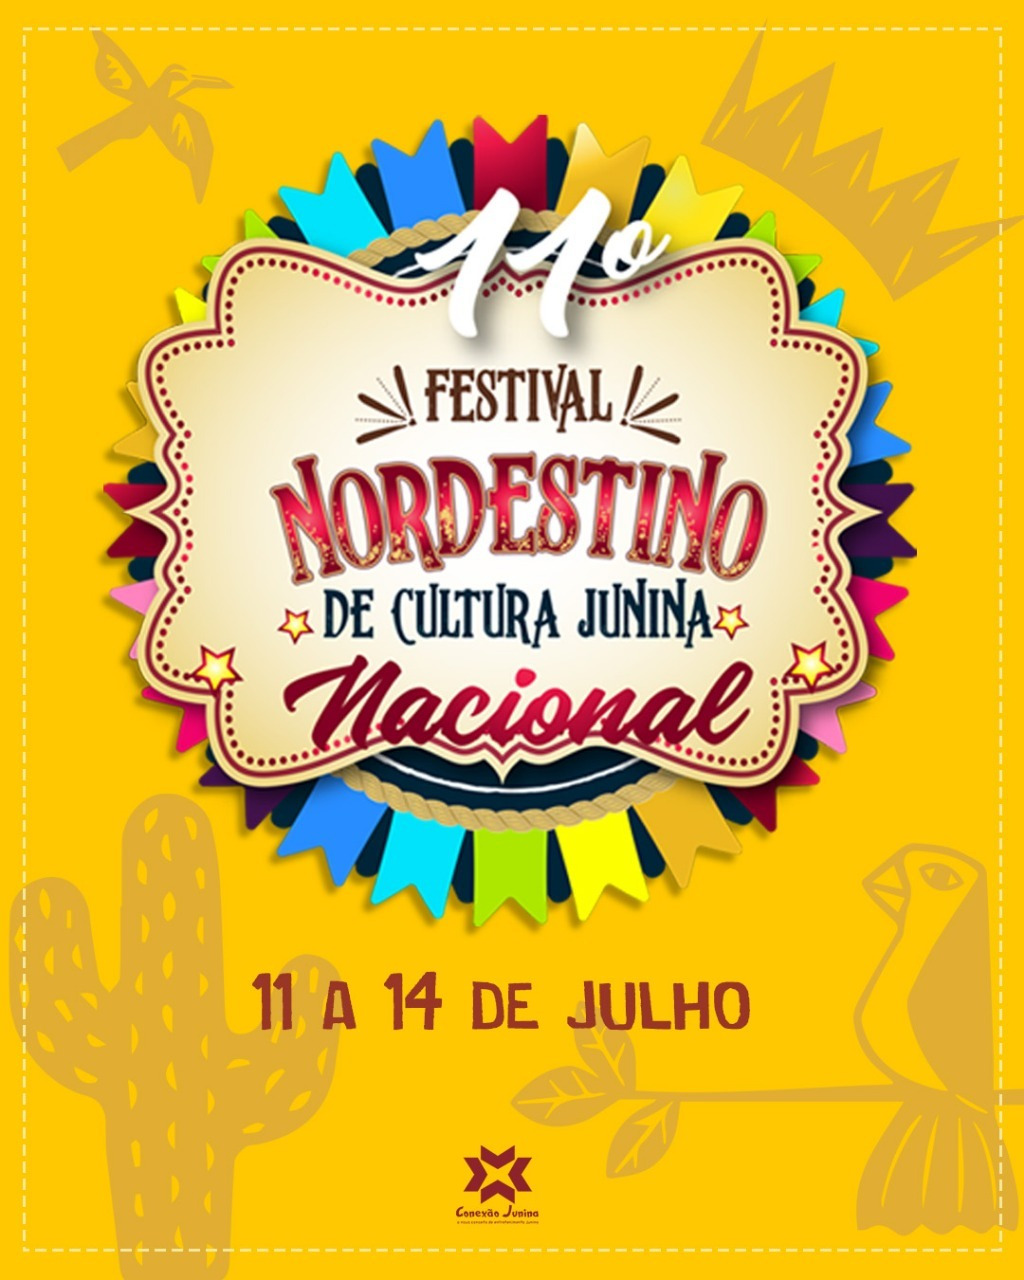 Festival Nordestino de Cultura Junina Nacional